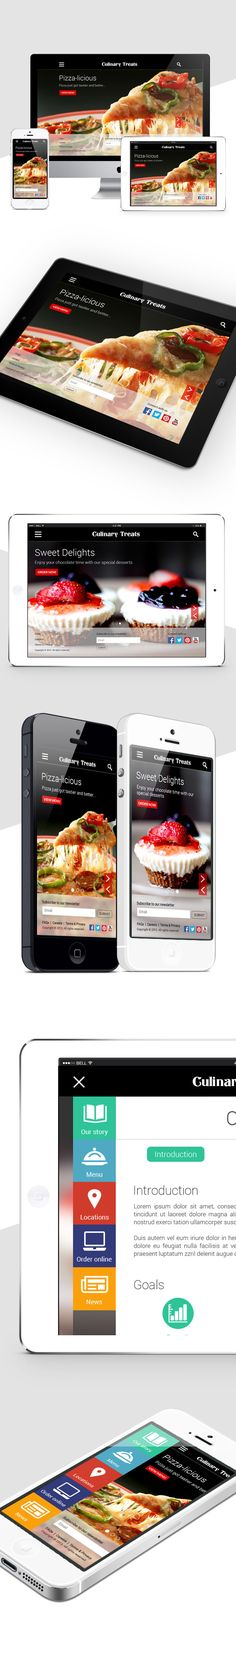 Culinary Treats - Website on Behance